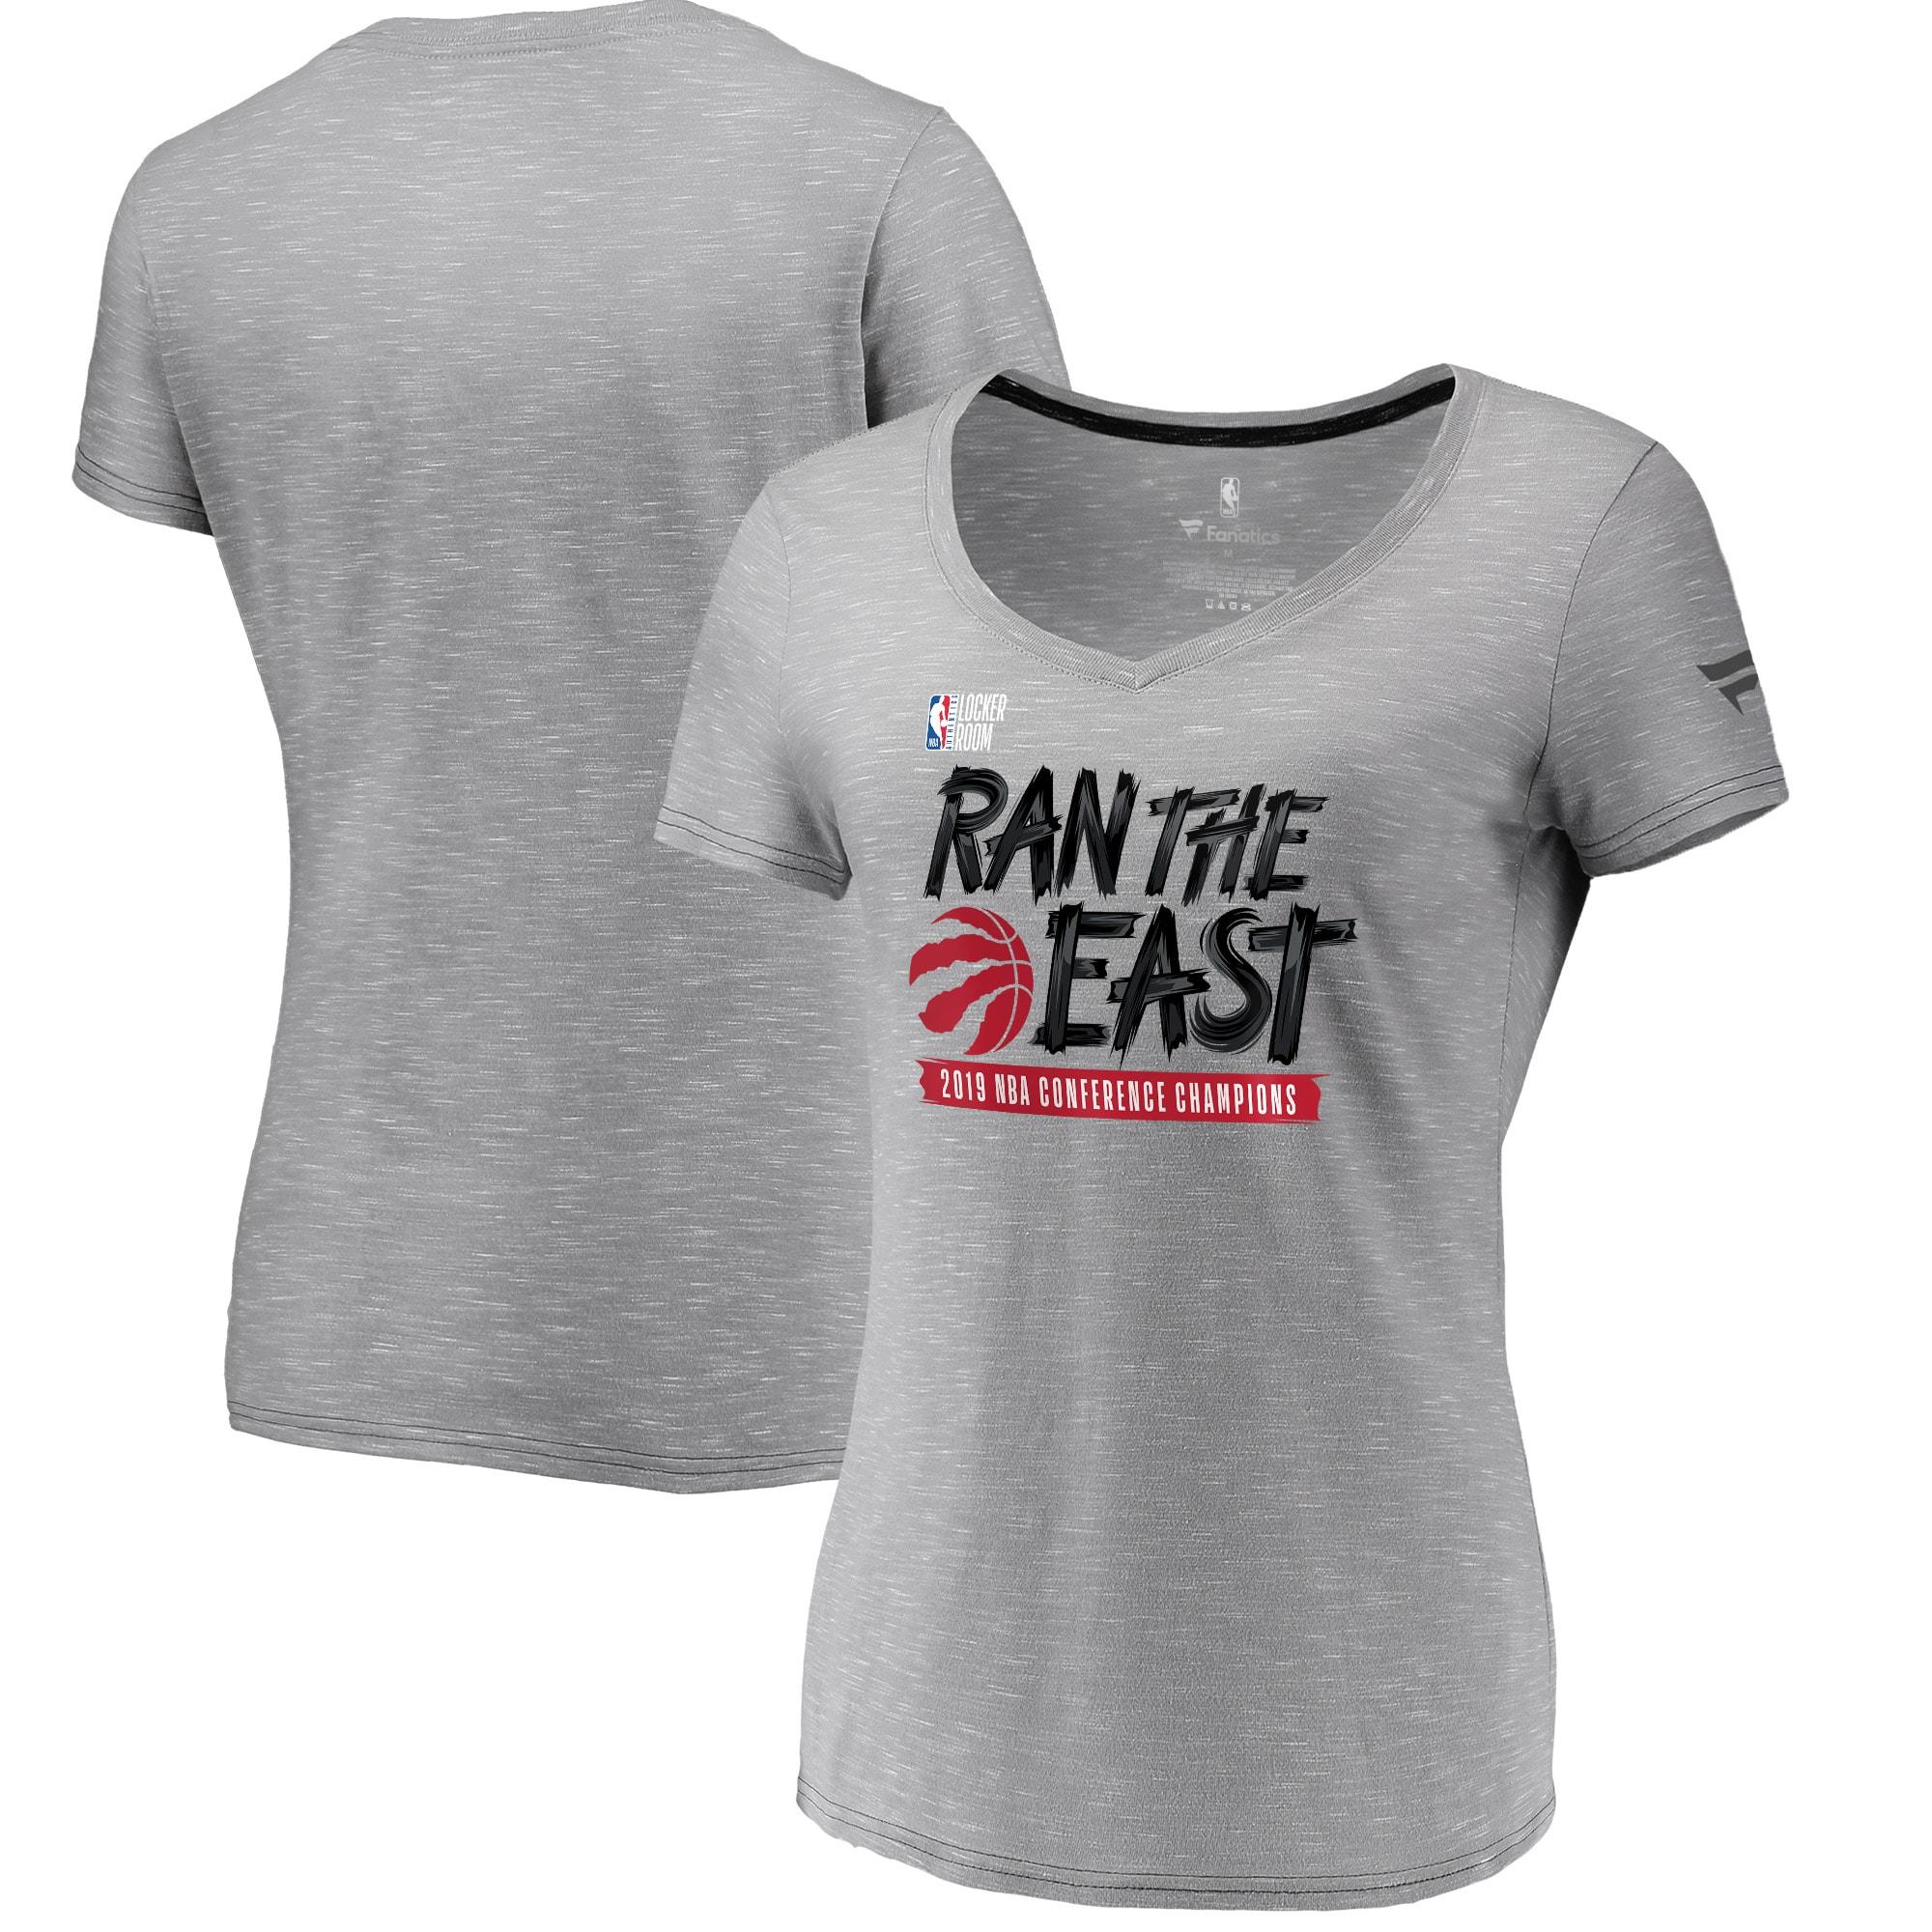 Toronto Raptors Fanatics Branded Women's 2019 Eastern Conference Champions Locker Room V-Neck T-Shirt - Gray